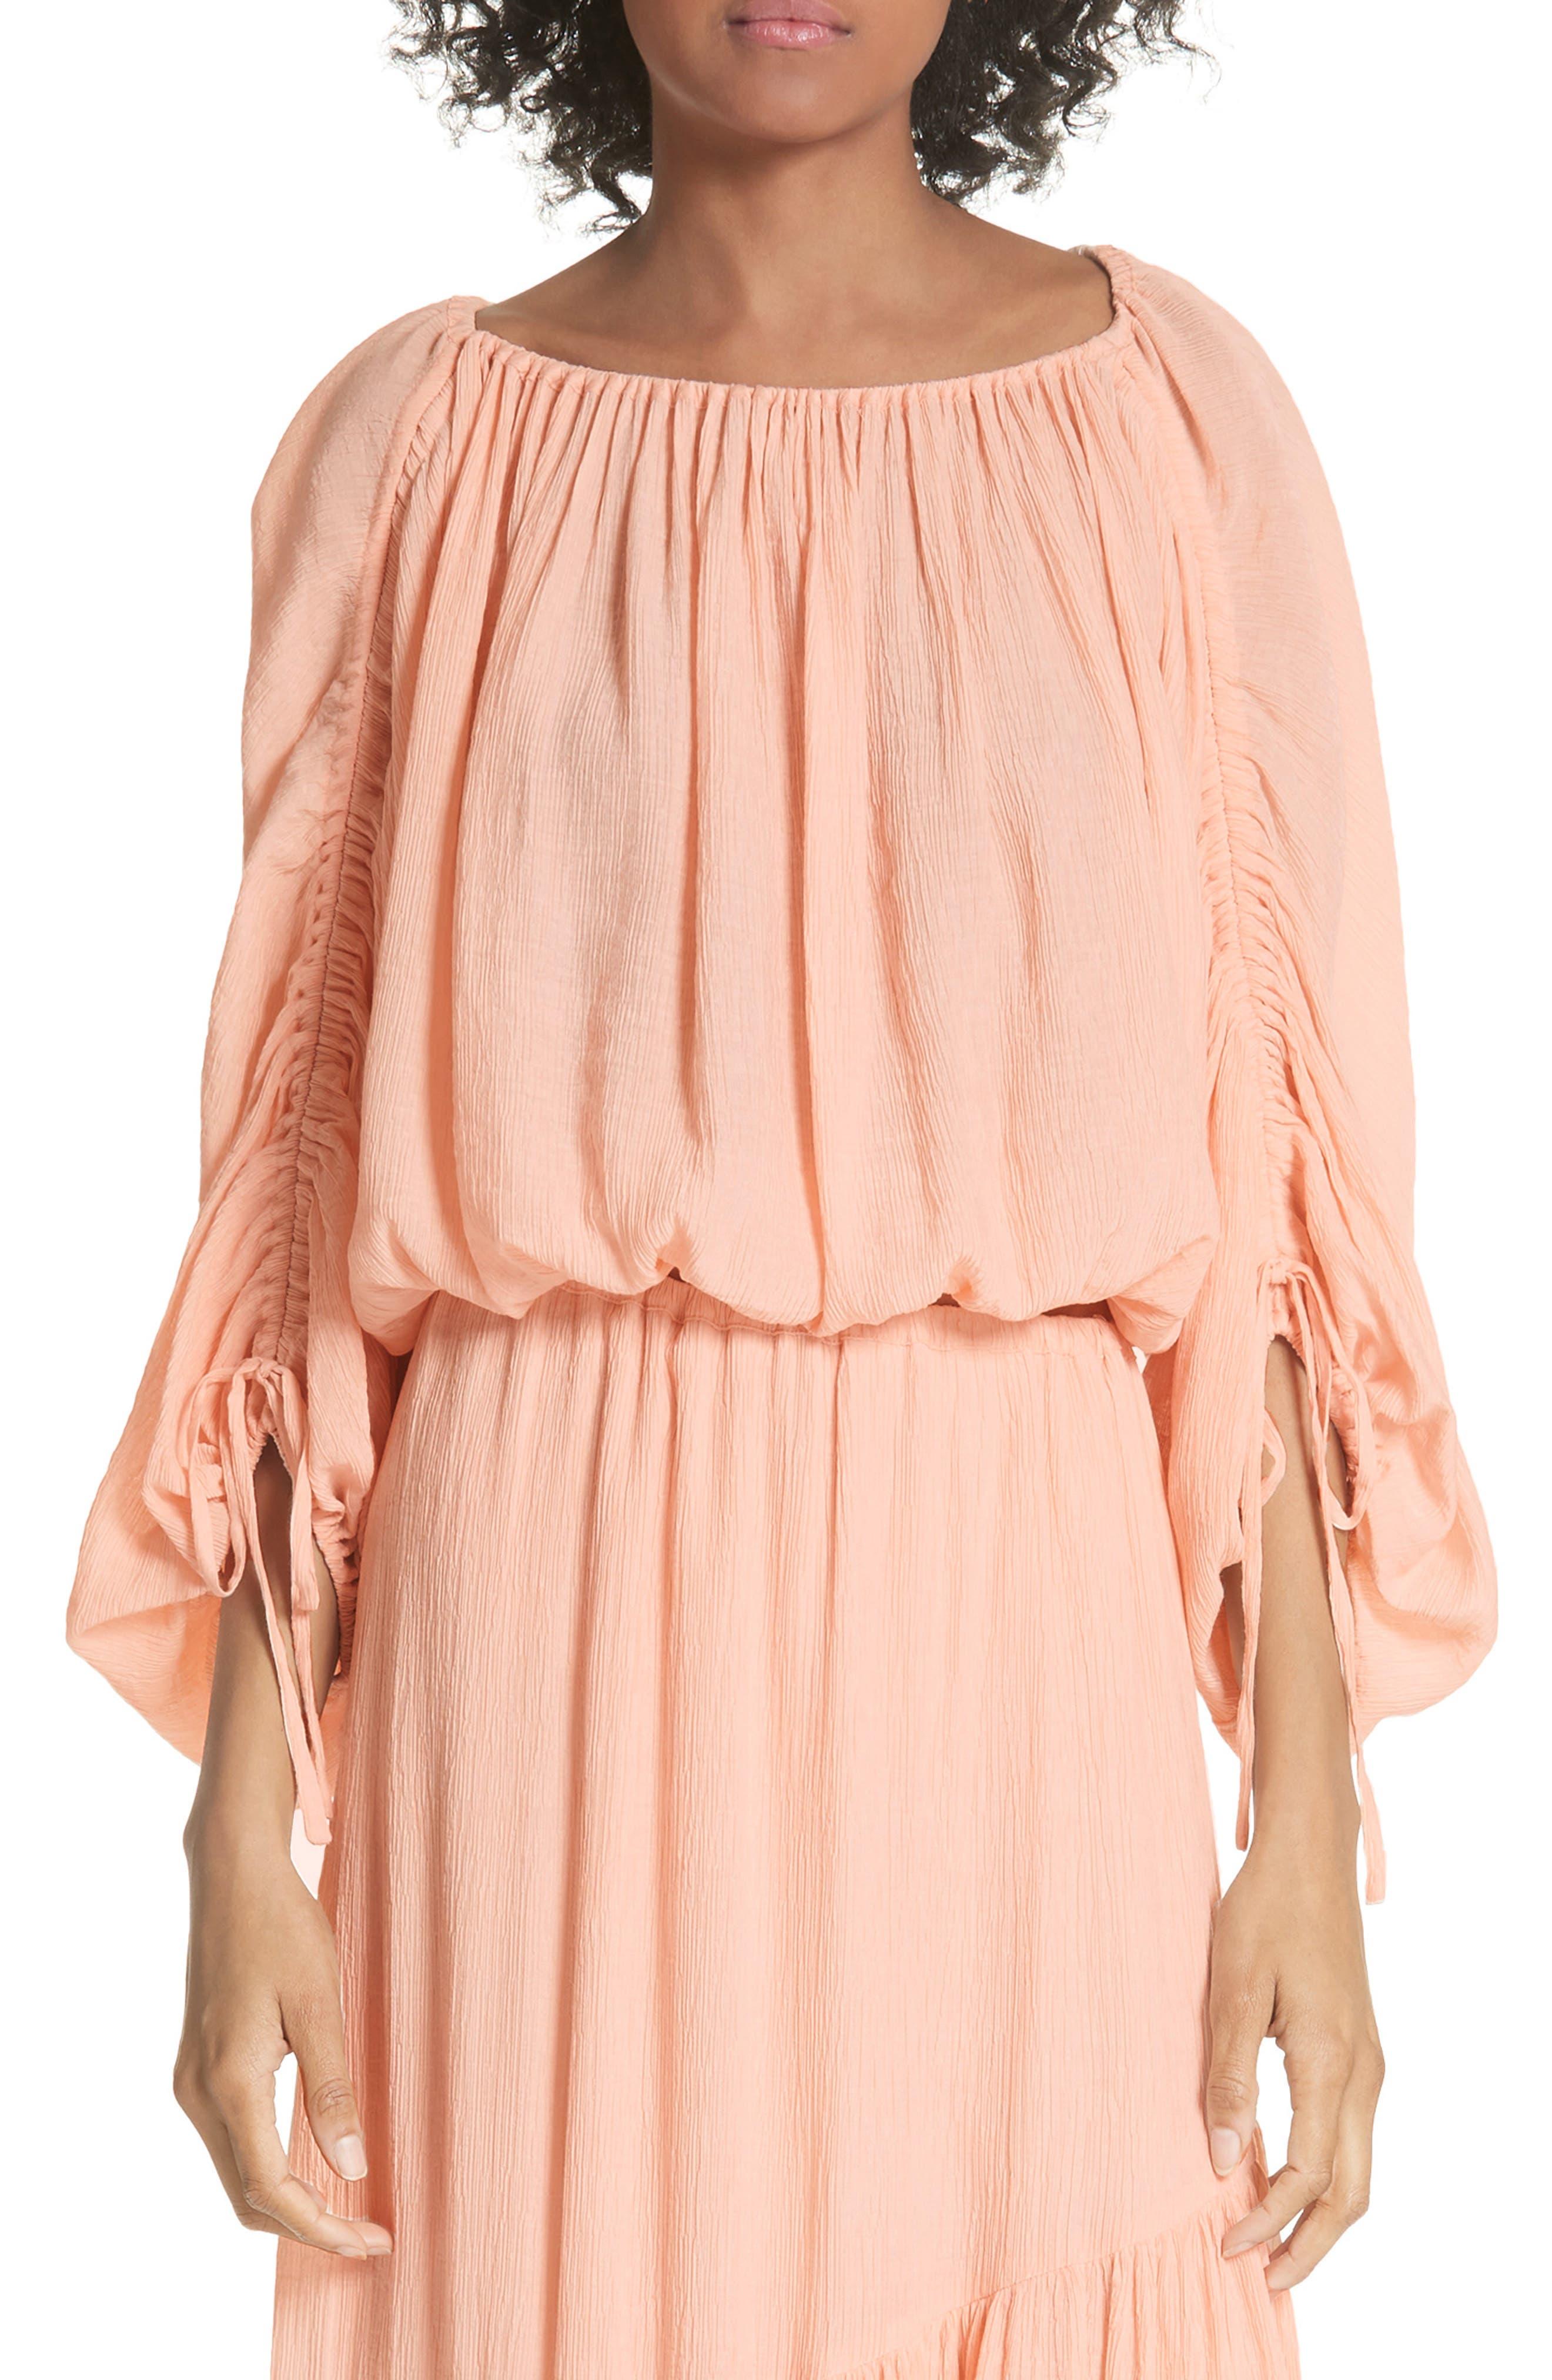 Elazara Ruched Sleeve Peasant Top,                         Main,                         color, 958